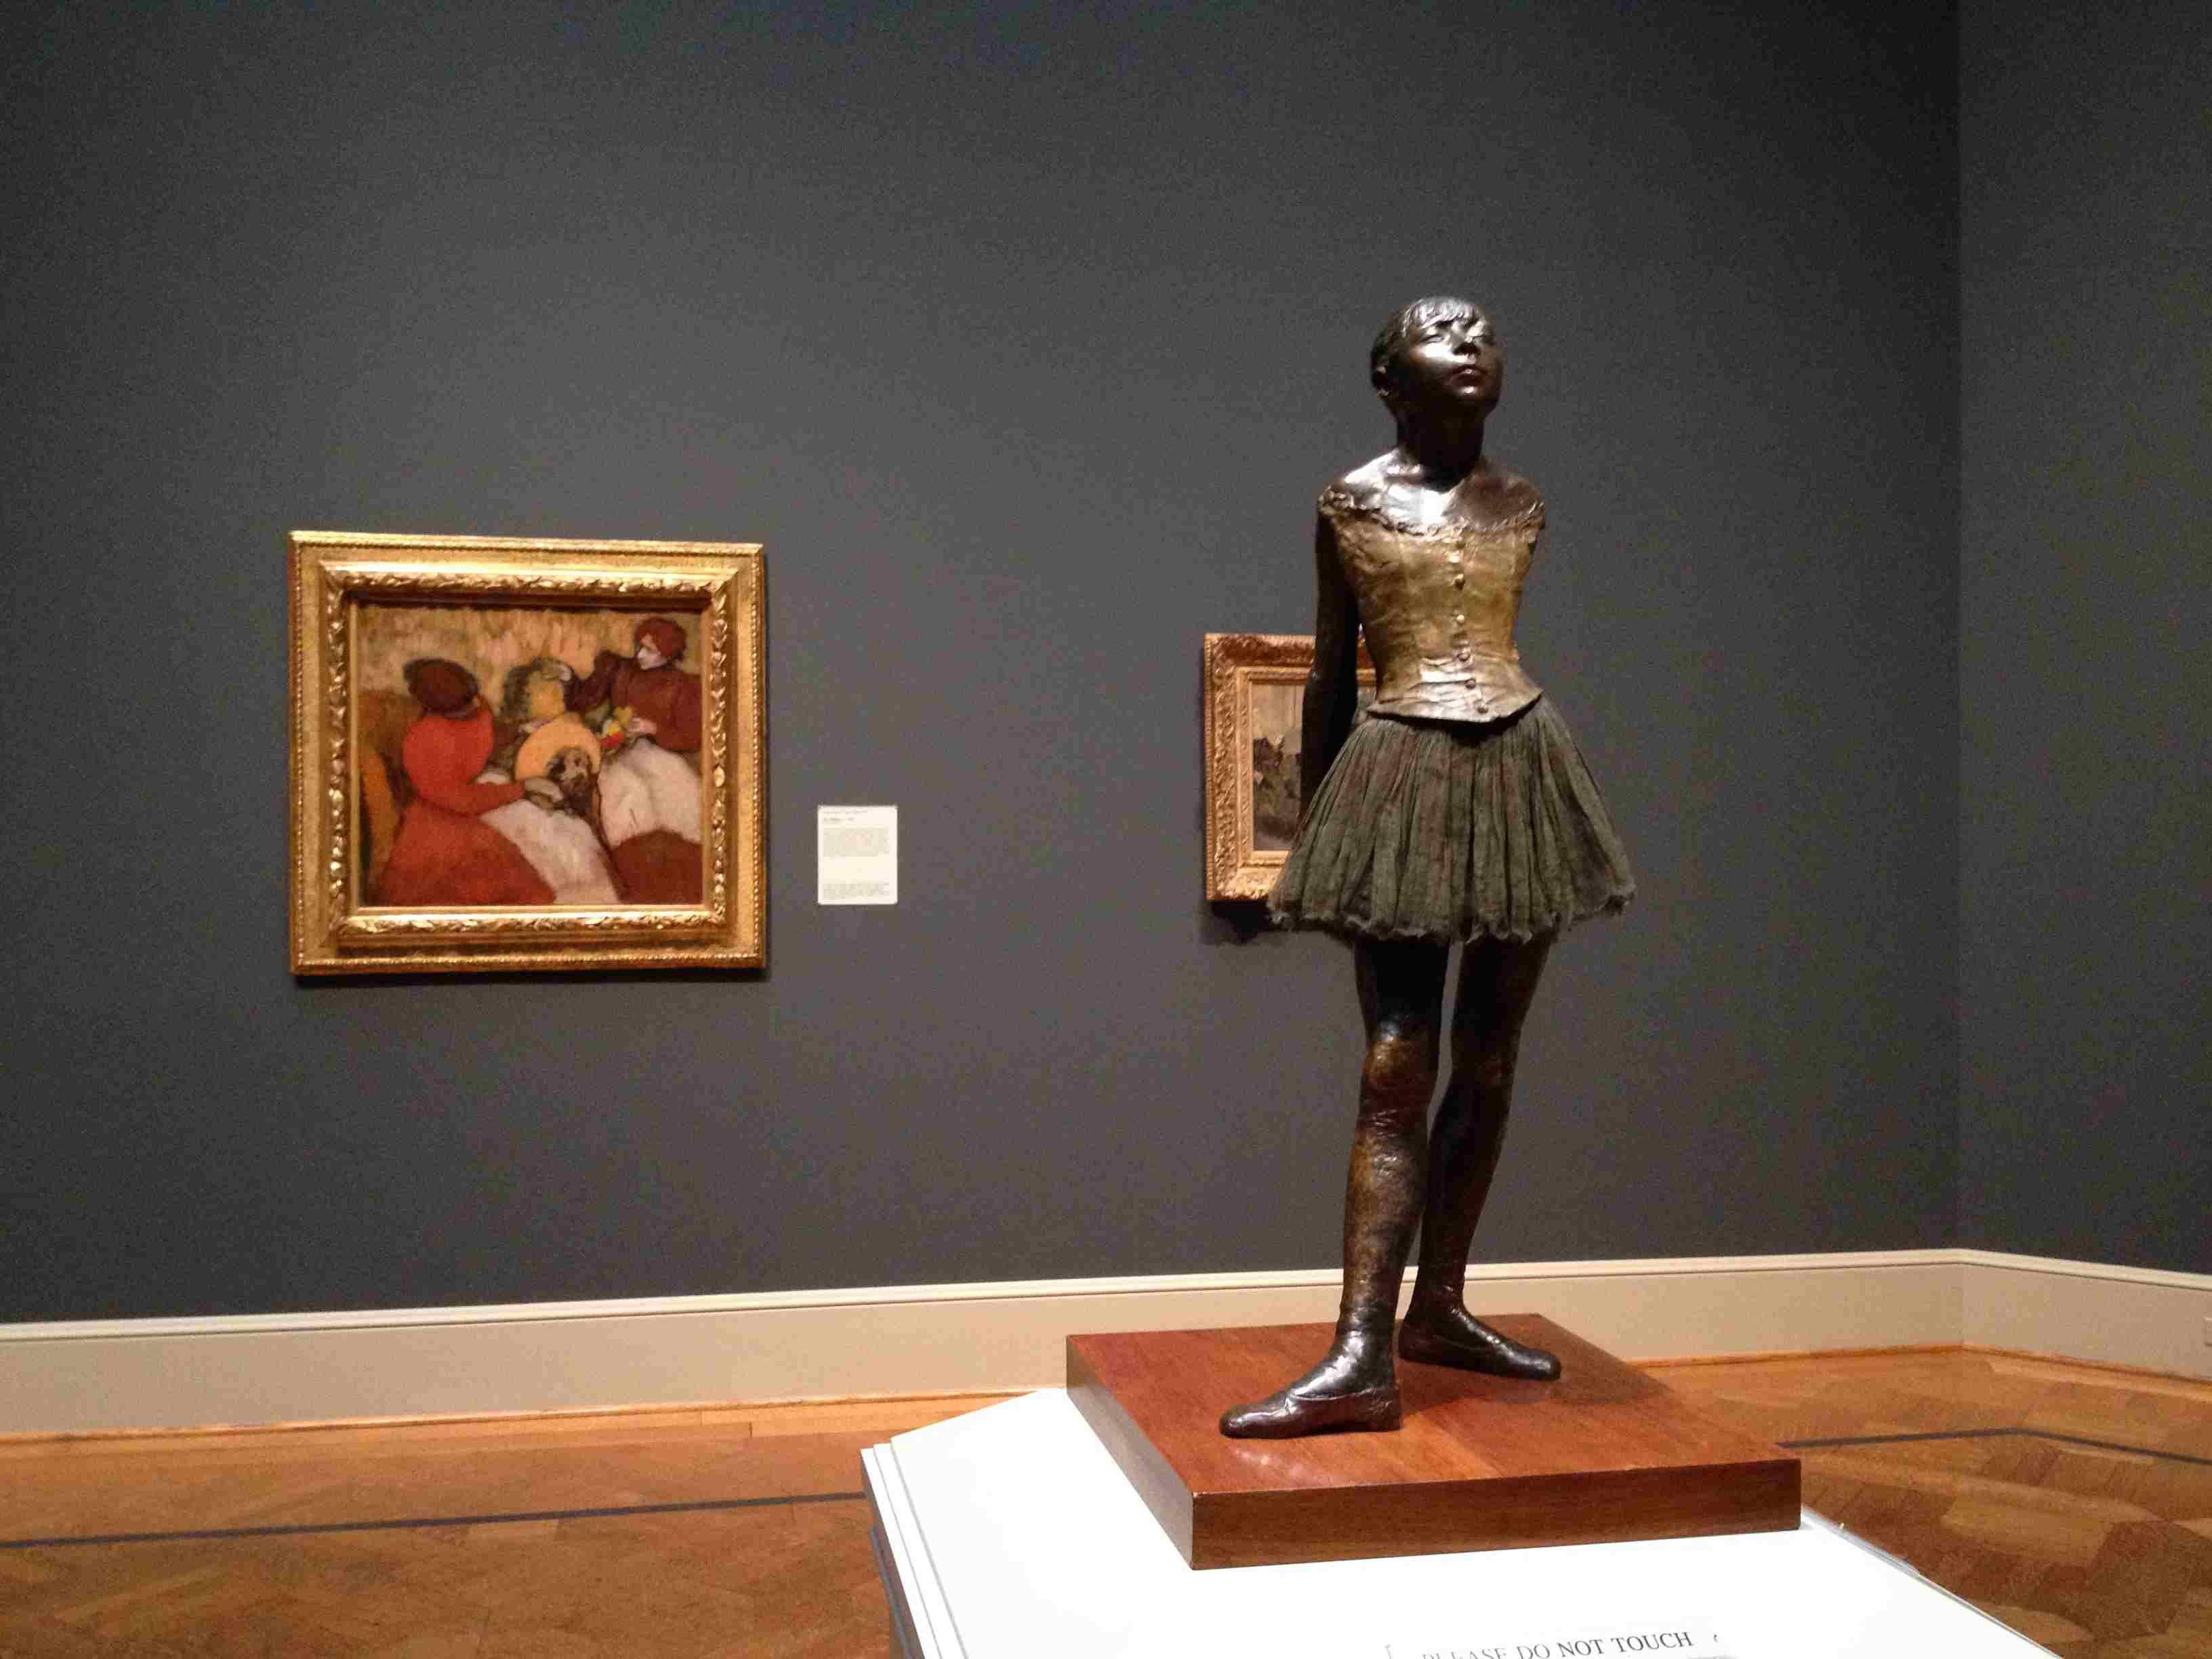 Degas' Little Dancer at the St. Louis Art Museum